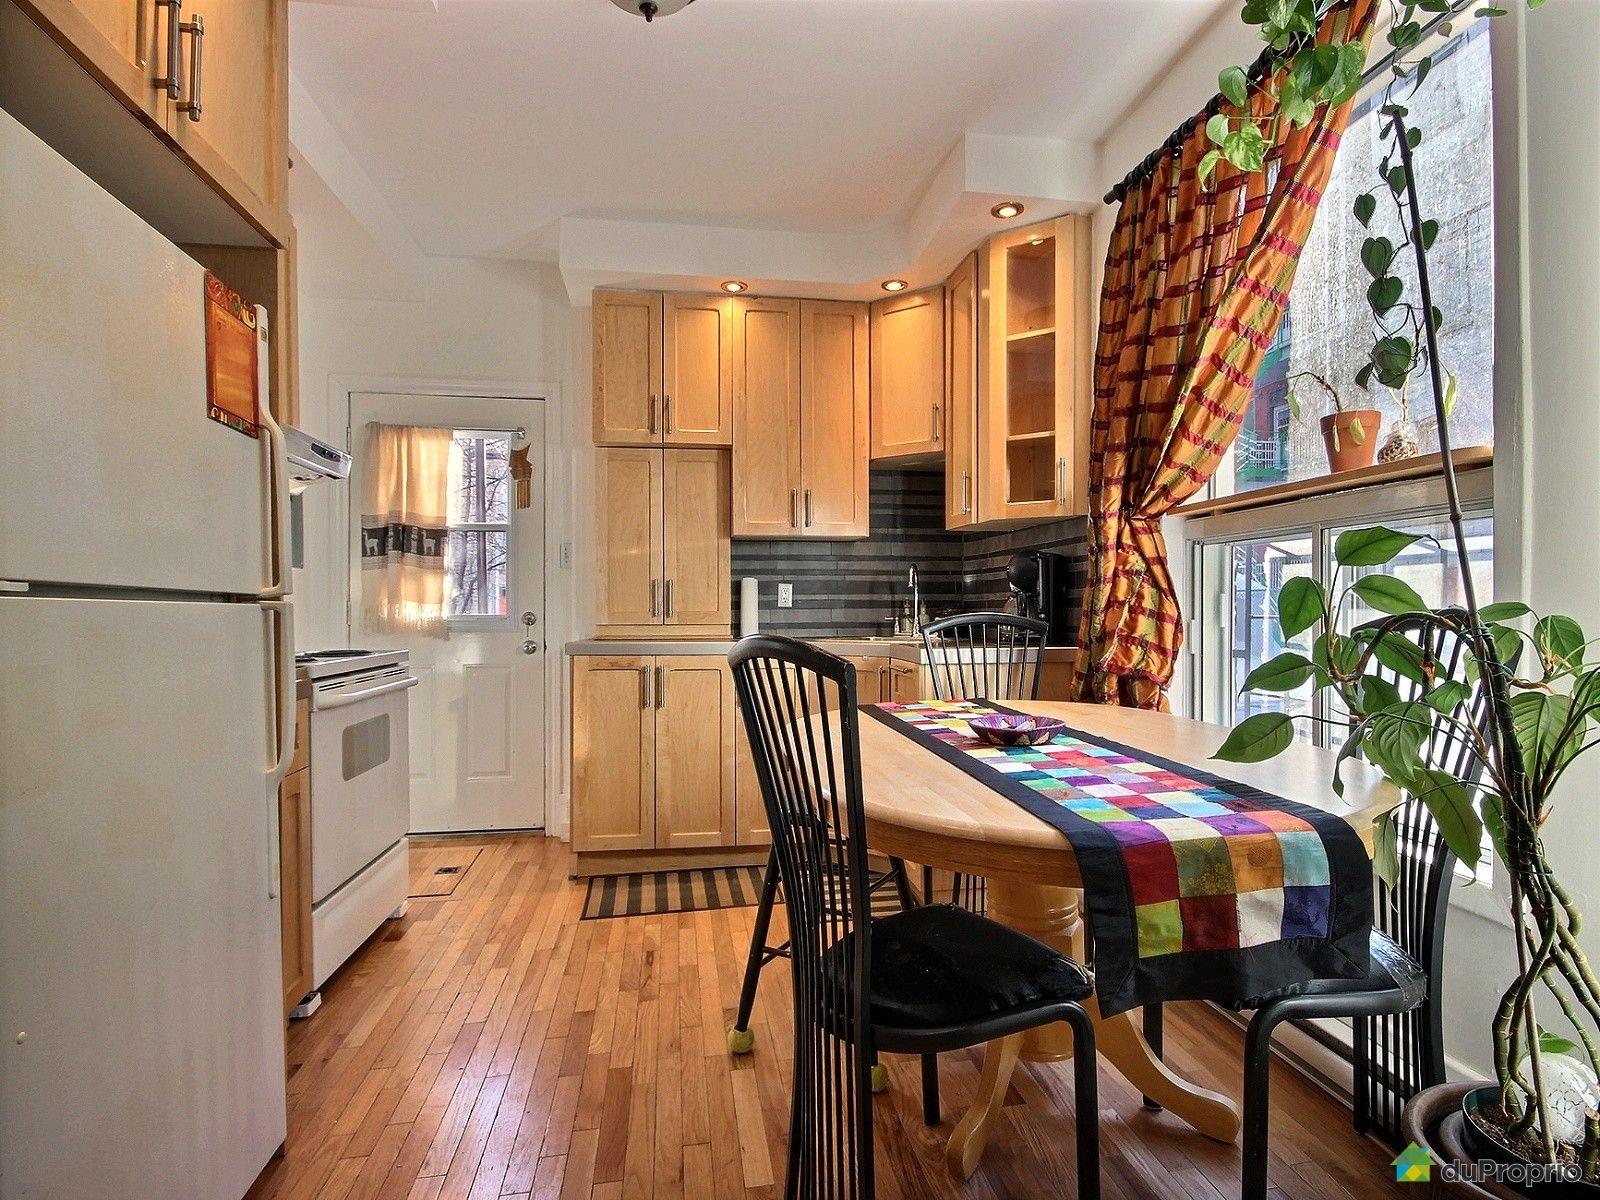 condo vendre montr al 4730 rue chabot immobilier qu bec duproprio 541671. Black Bedroom Furniture Sets. Home Design Ideas